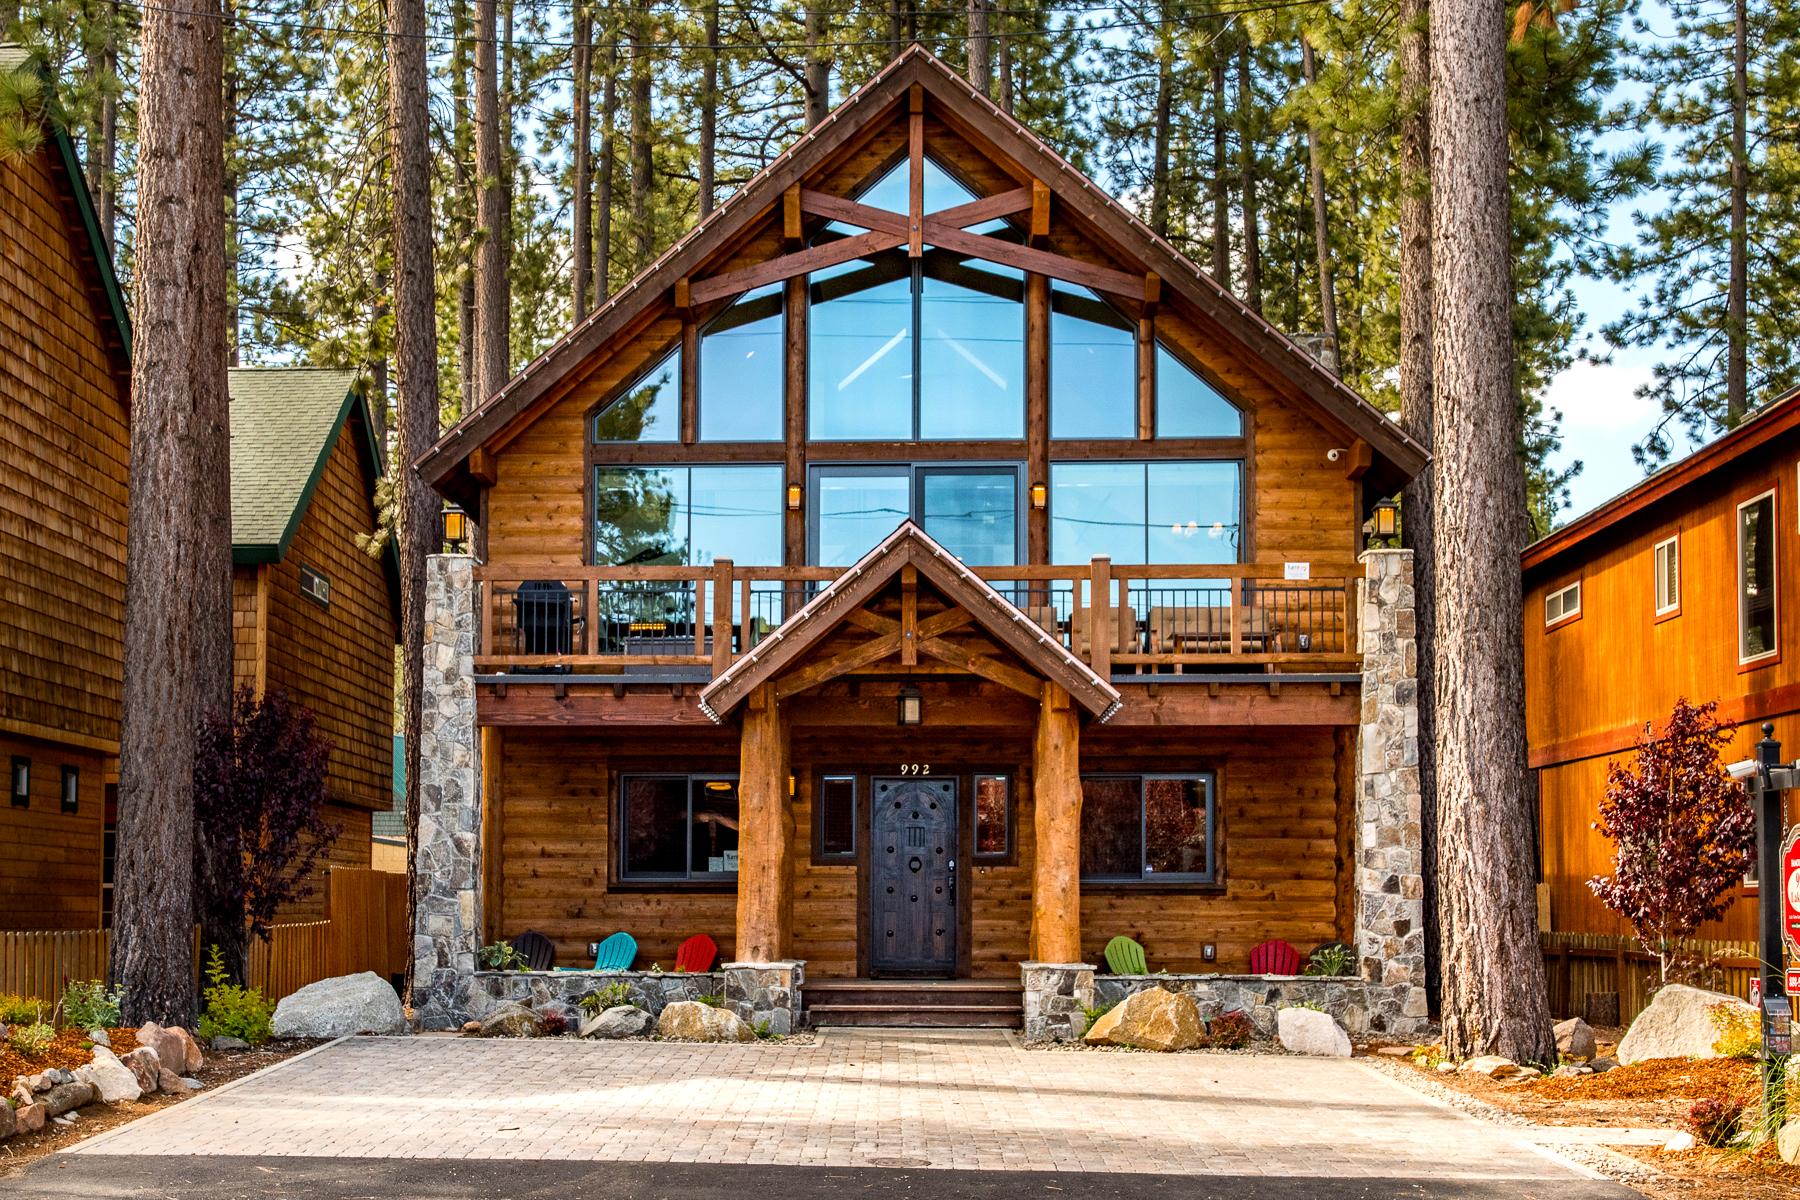 5br 4ba lake tahoe luxury vacation rental ra88271 for Rental cabins in south lake tahoe